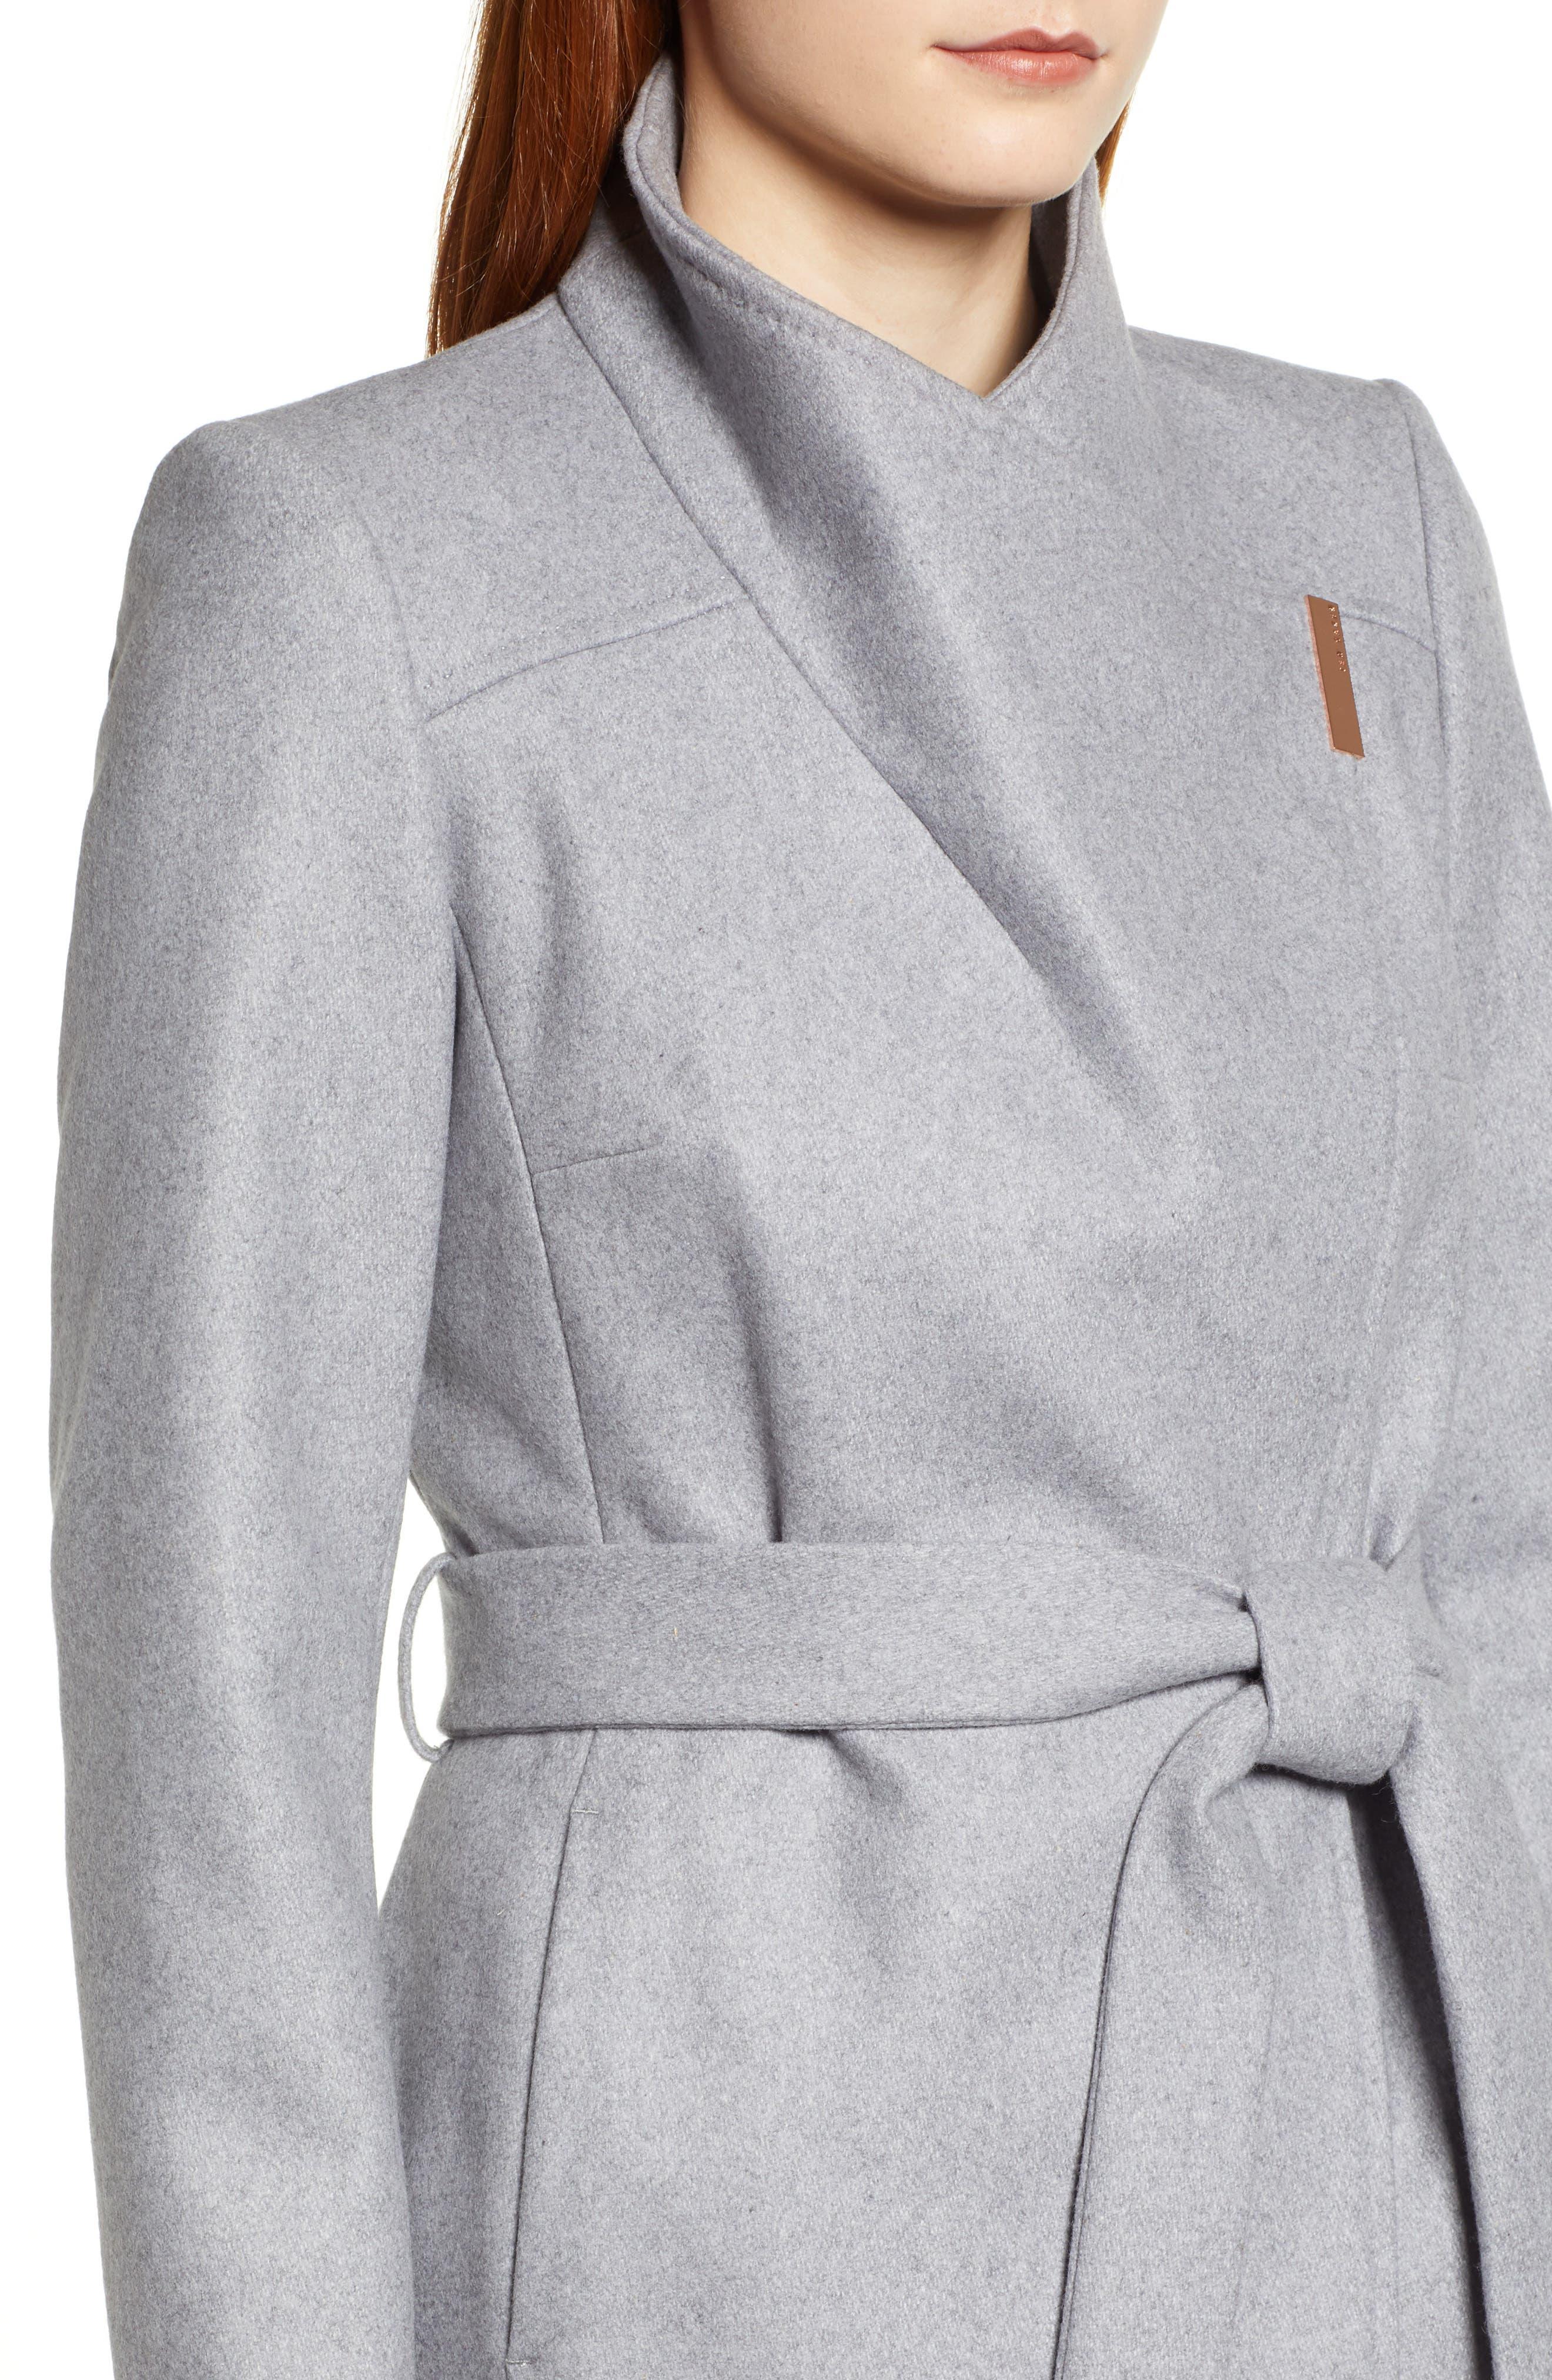 Ted Baker Londer Midi Wool Wrap Coat,                             Alternate thumbnail 4, color,                             GREY